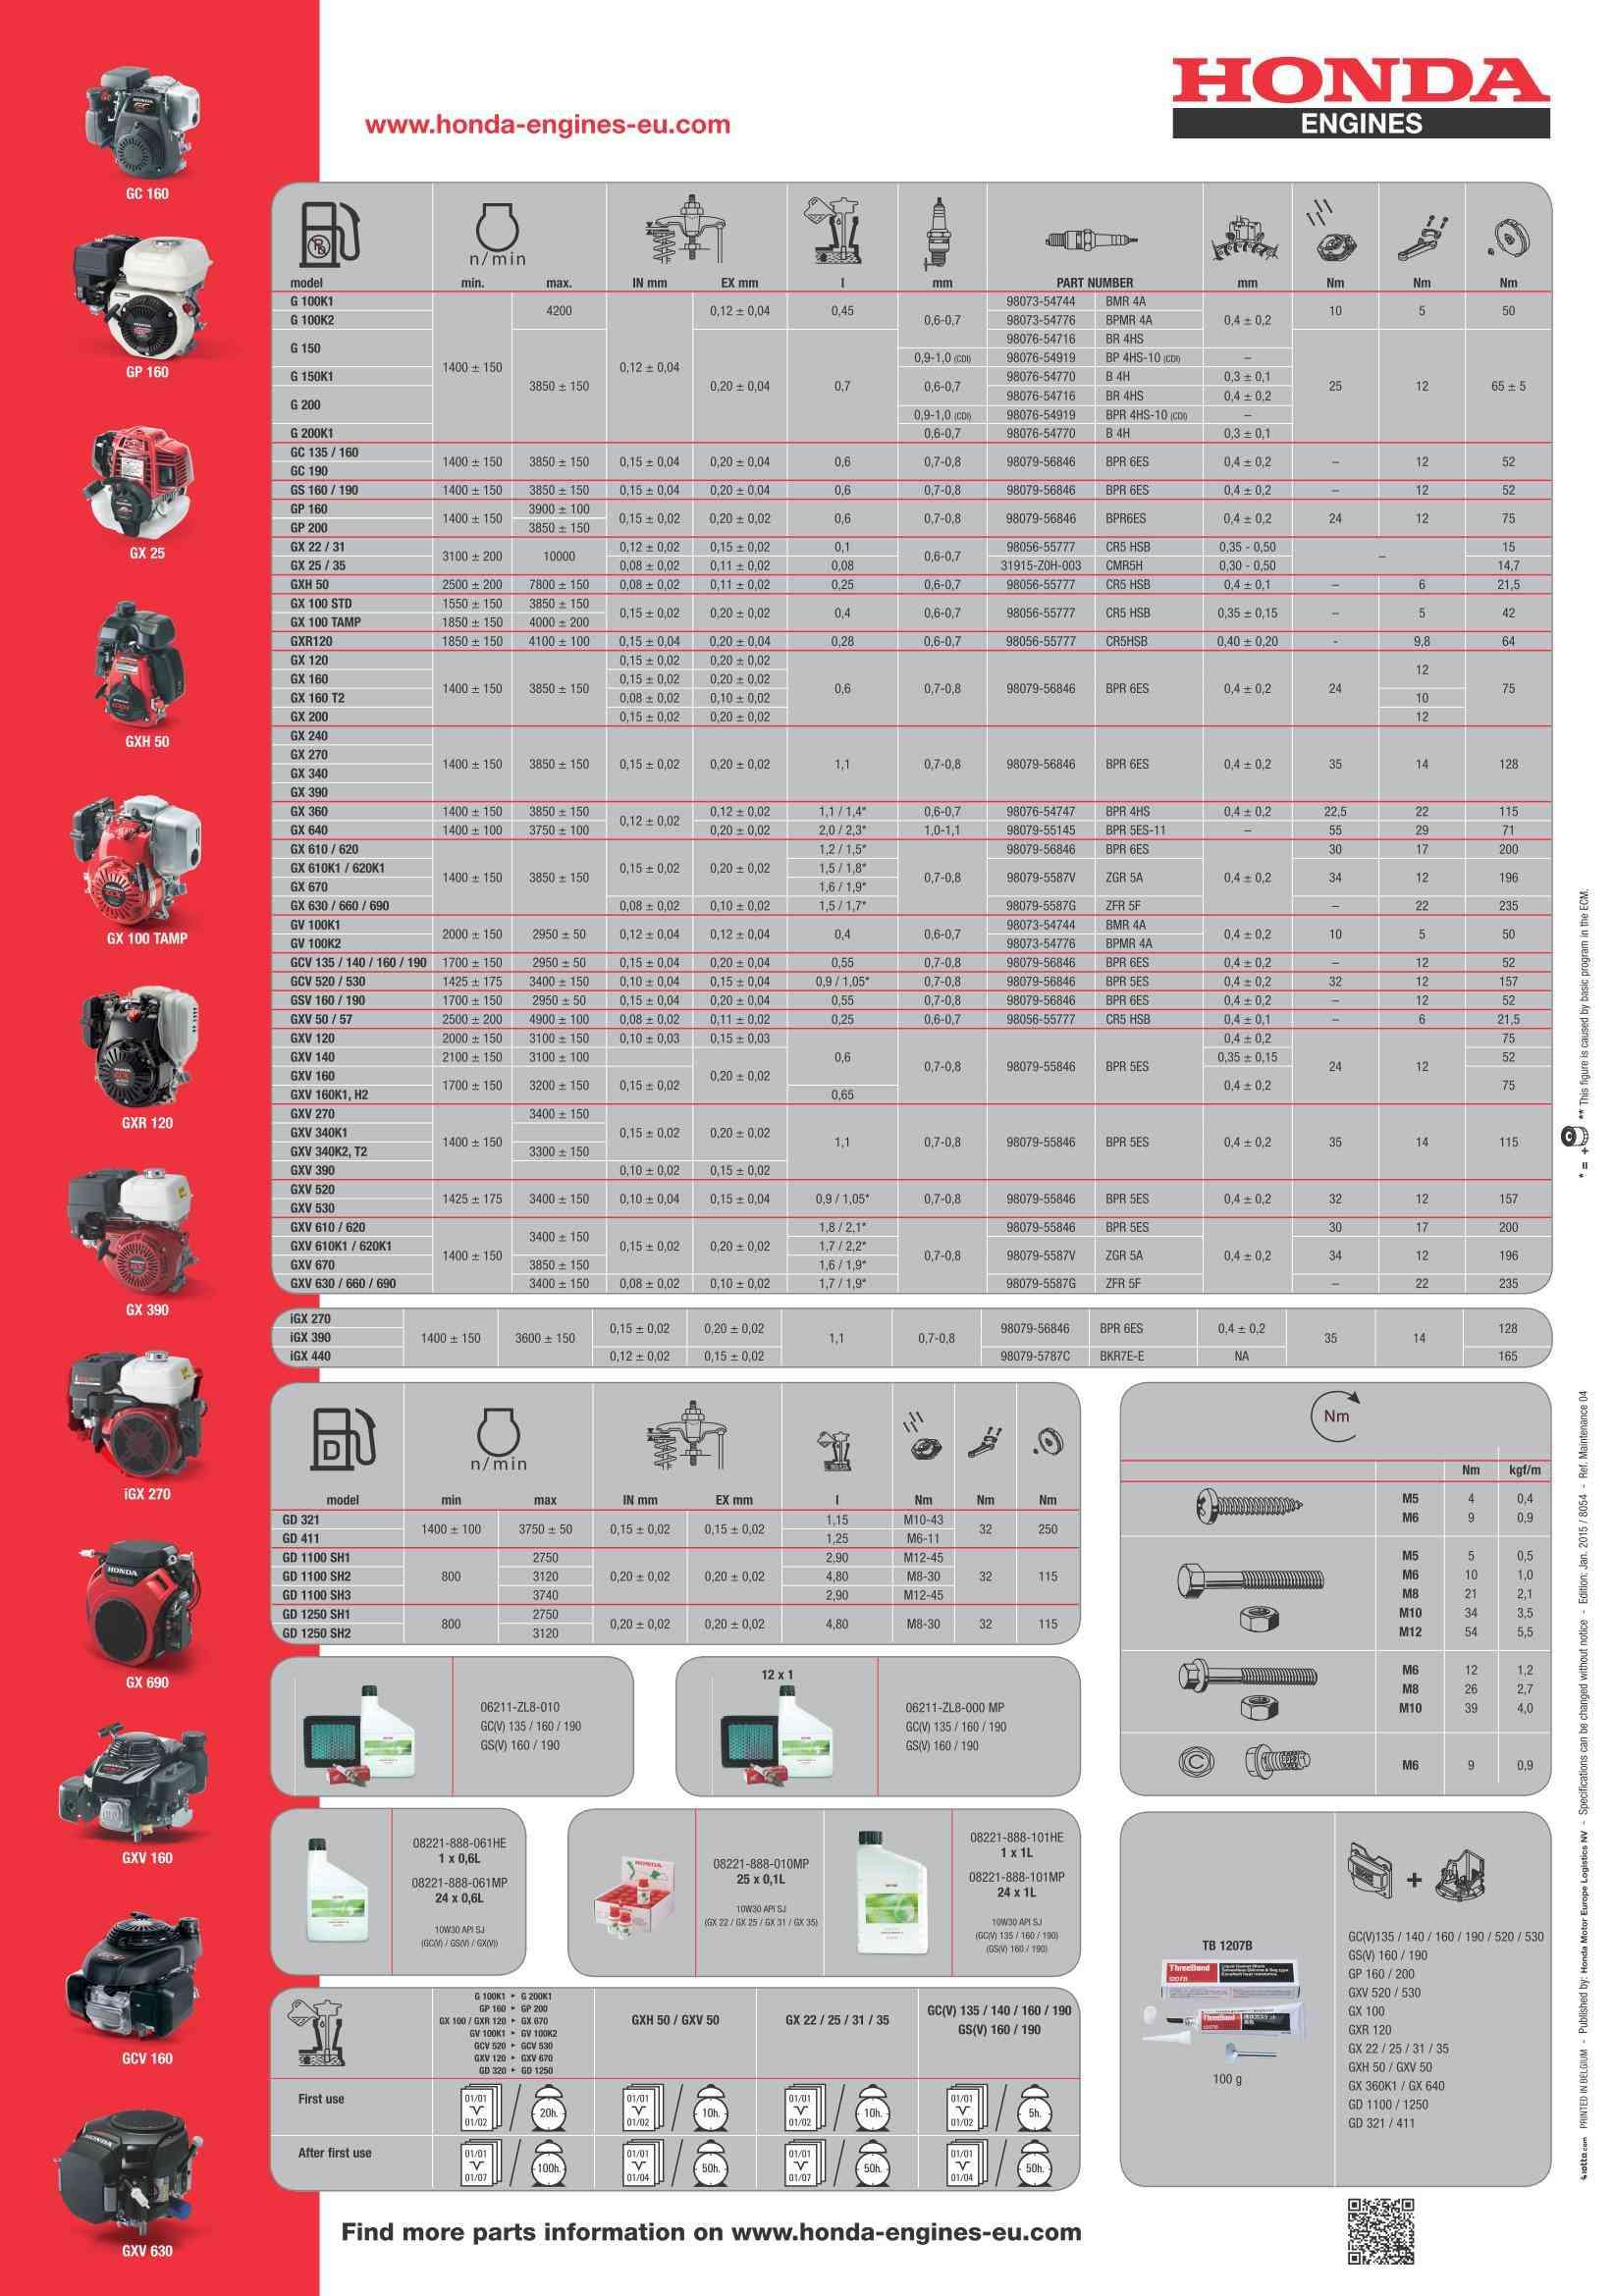 Notices Motoculture: Agria, Bernard, Bouyer, Ferrari, Goldoni, Honda, Kubota, Lombardini, Motostandard, Staub, Wolf ... Uw111